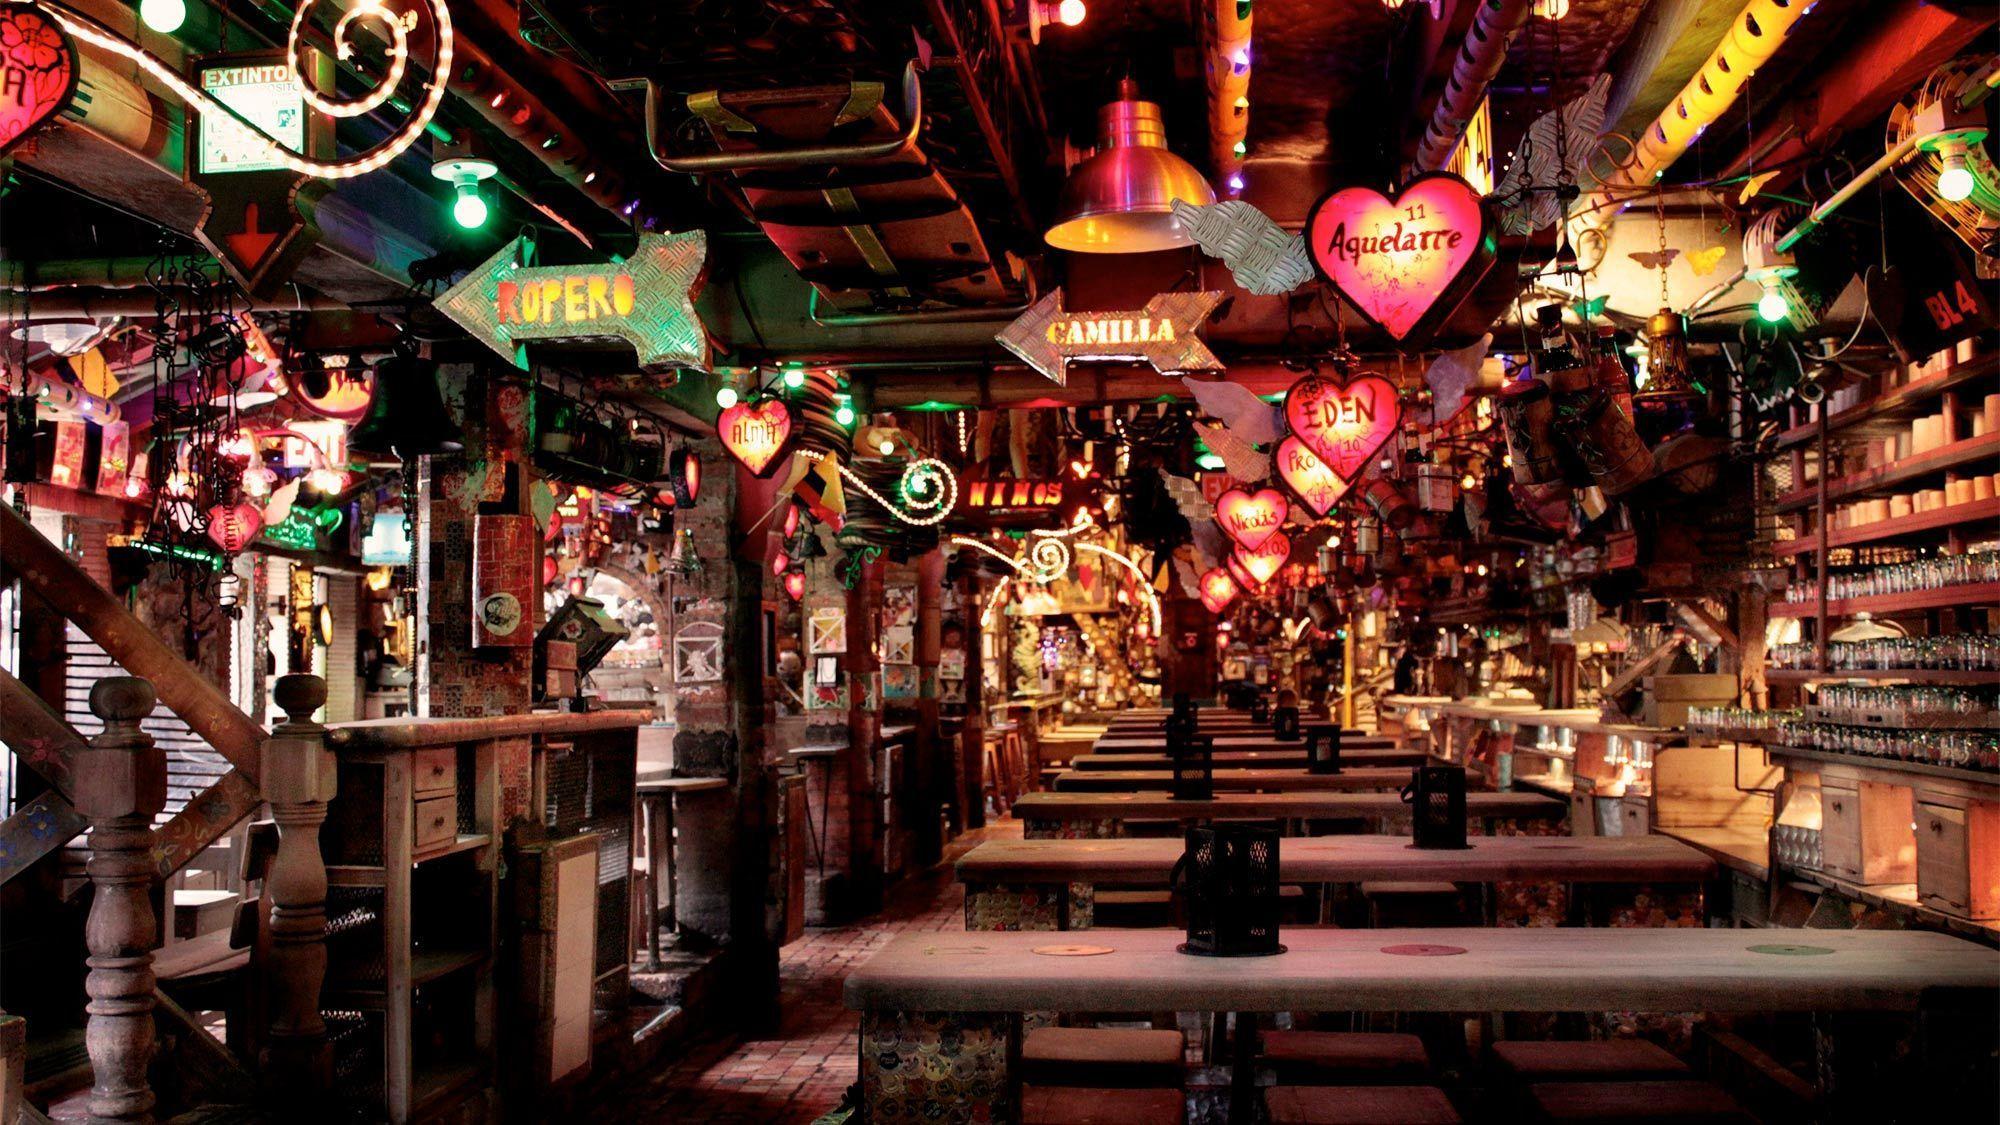 Interior view of the Andres Carne de Res restaurant-nightclub in Bogota